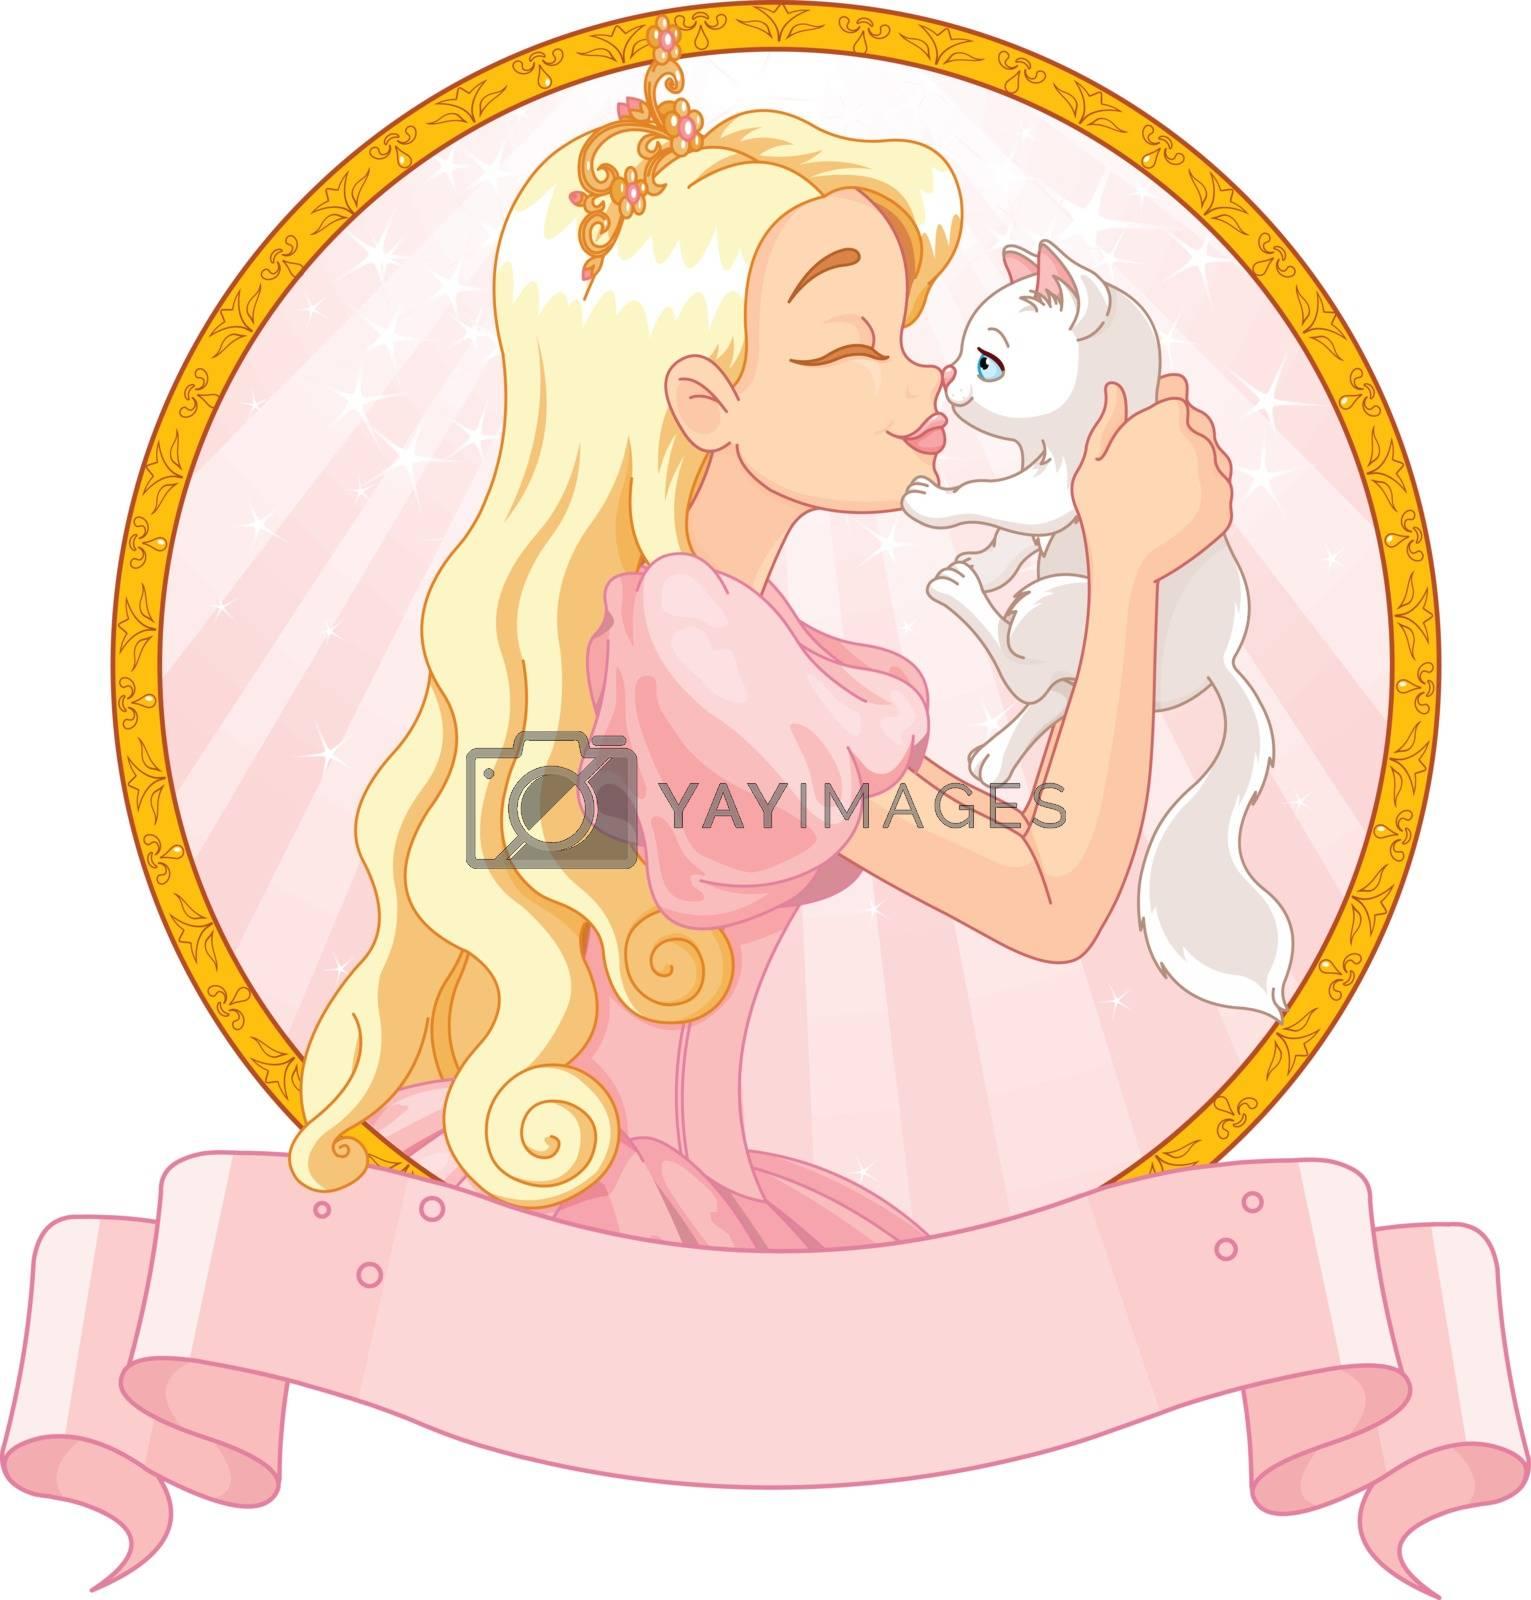 Royalty free image of Princess and Cat by Dazdraperma